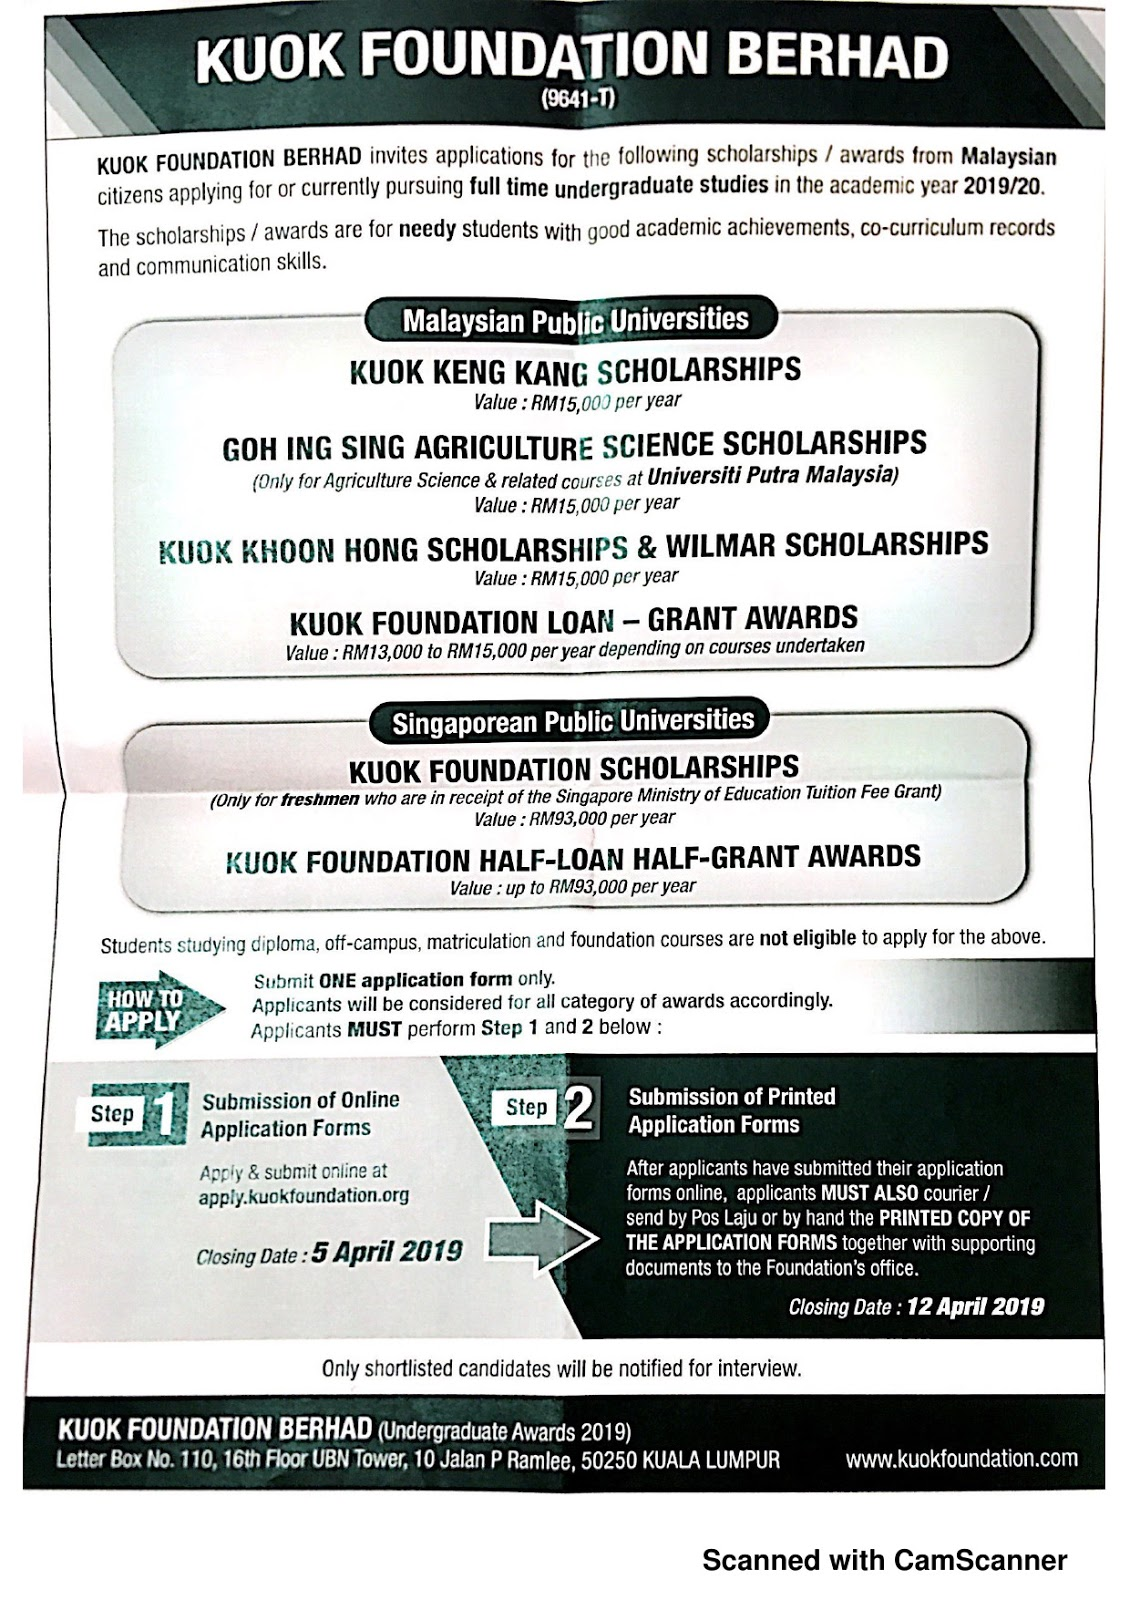 Official Career Job Info And Opportunity Mechanical Eng Usm Kuok Foundation Undergraduate Awards 2019